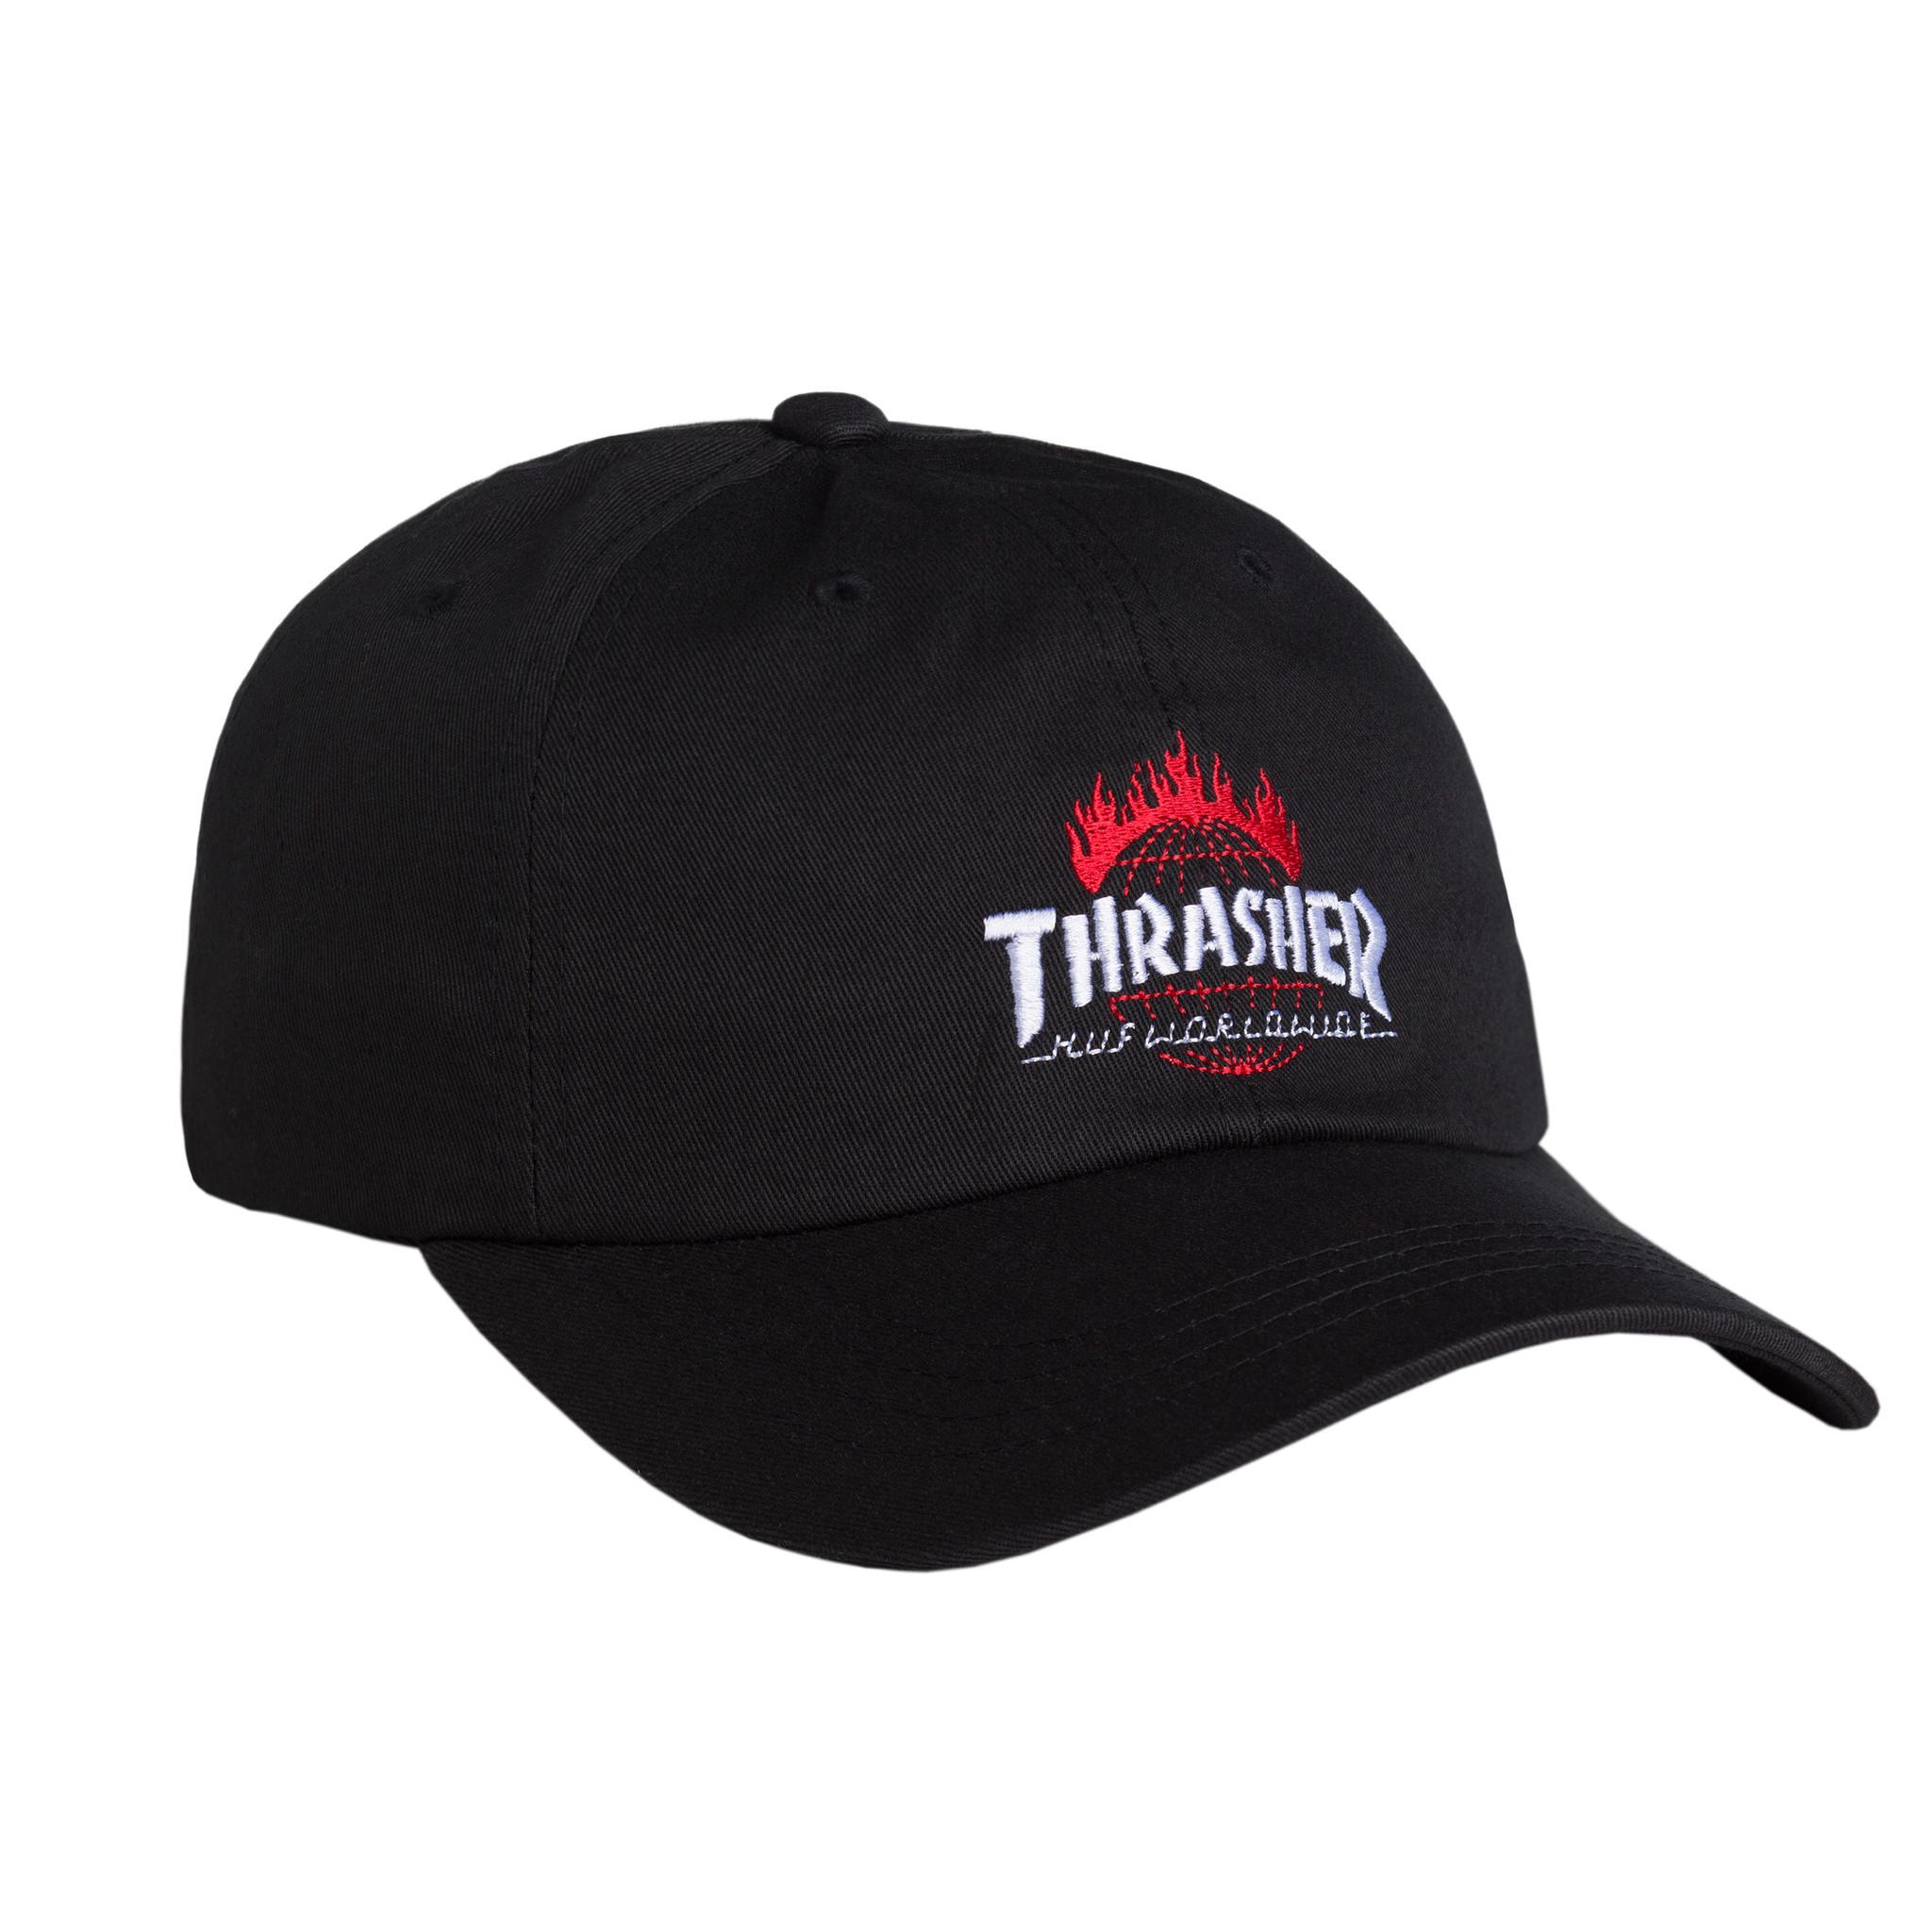 Thrasher tds curve visor 6 panel black ht65m03 black 01